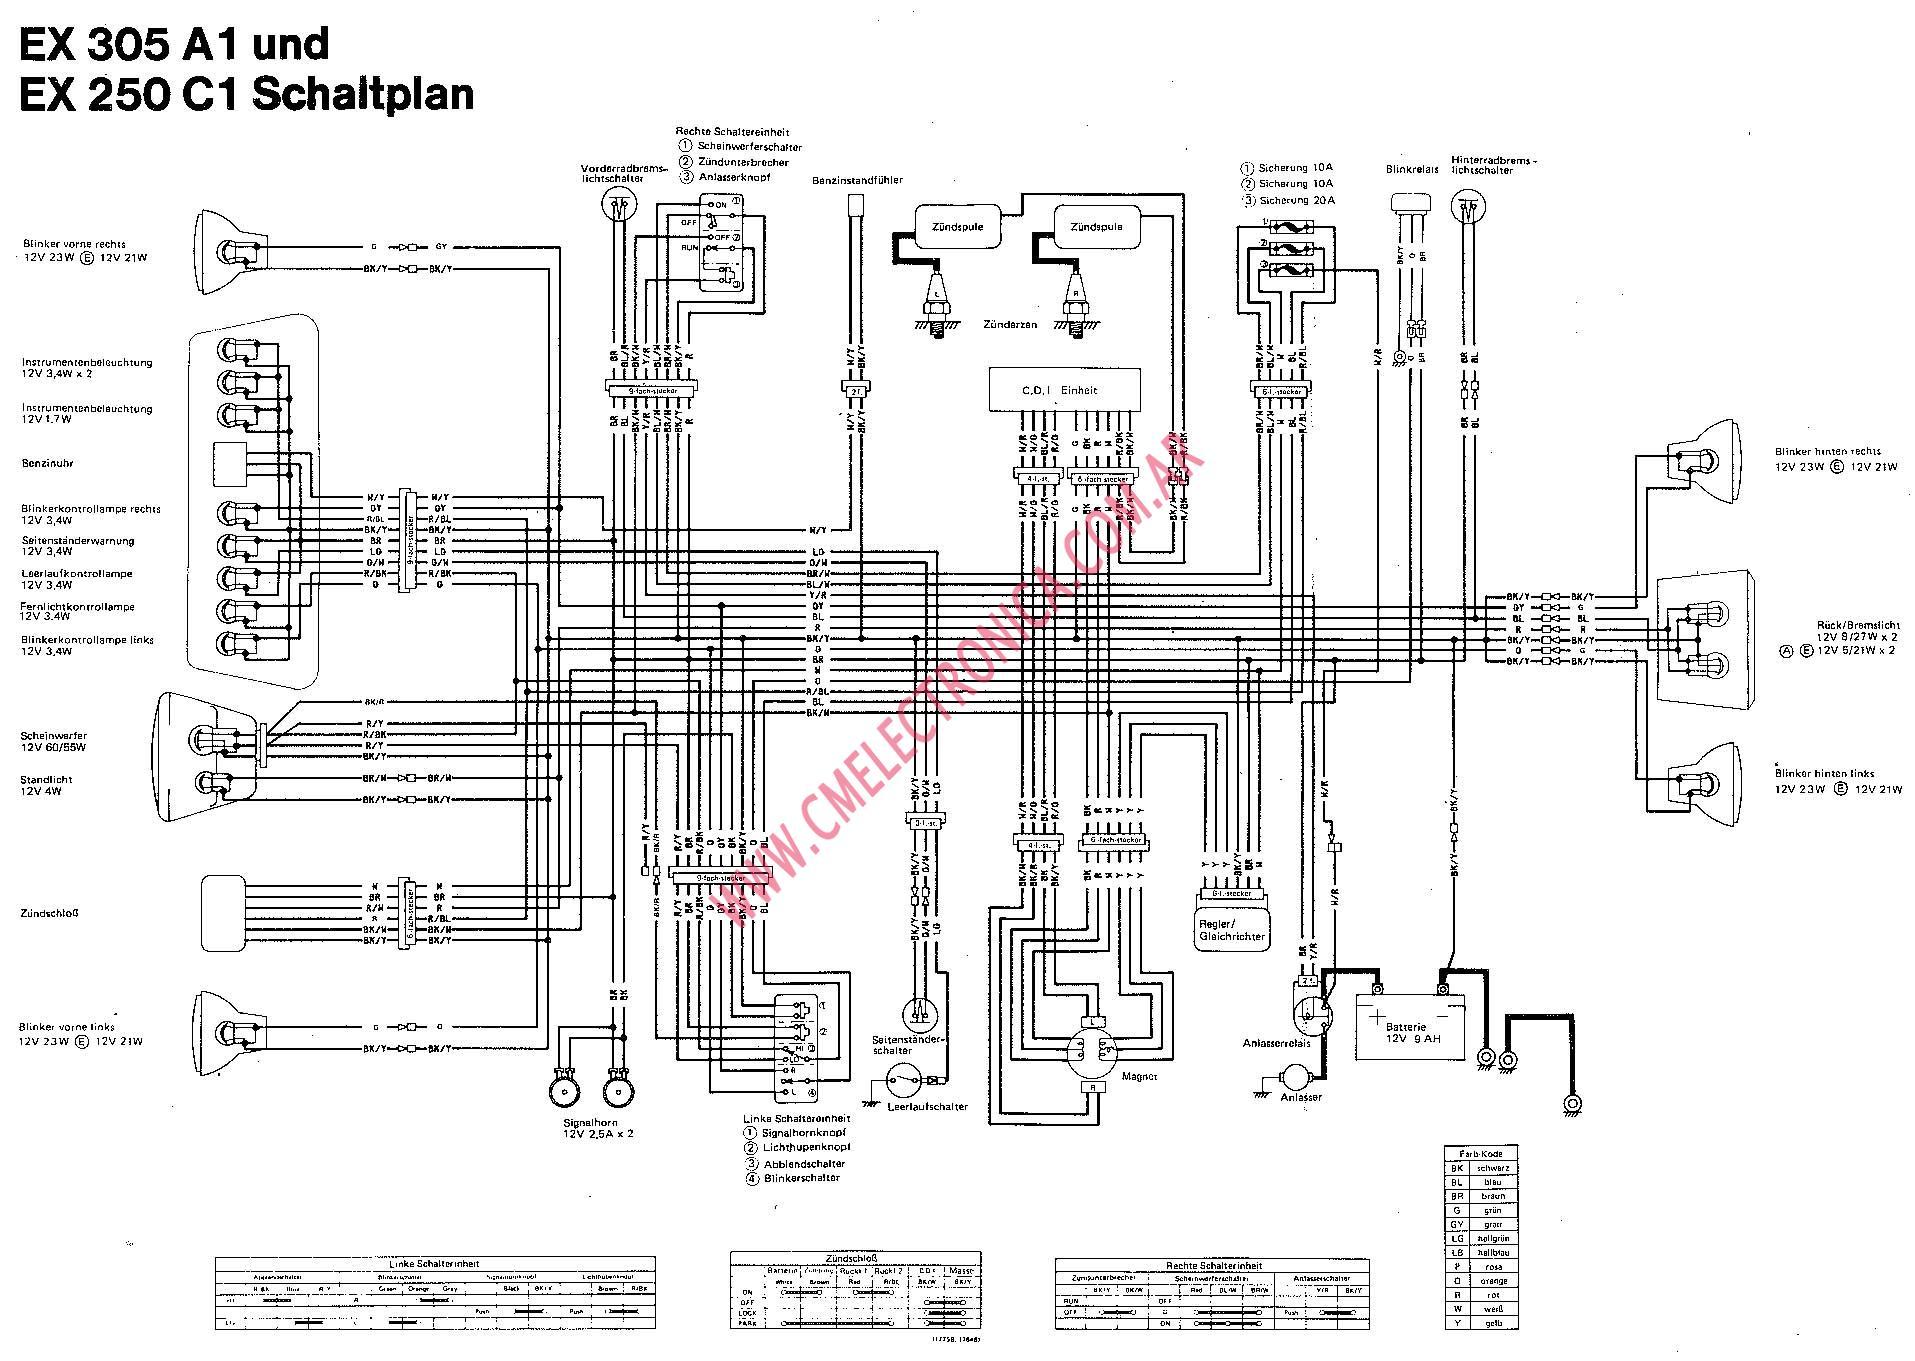 Fantastic Suzuki Lt80 Wiring Diagram Photos - Everything You Need to ...